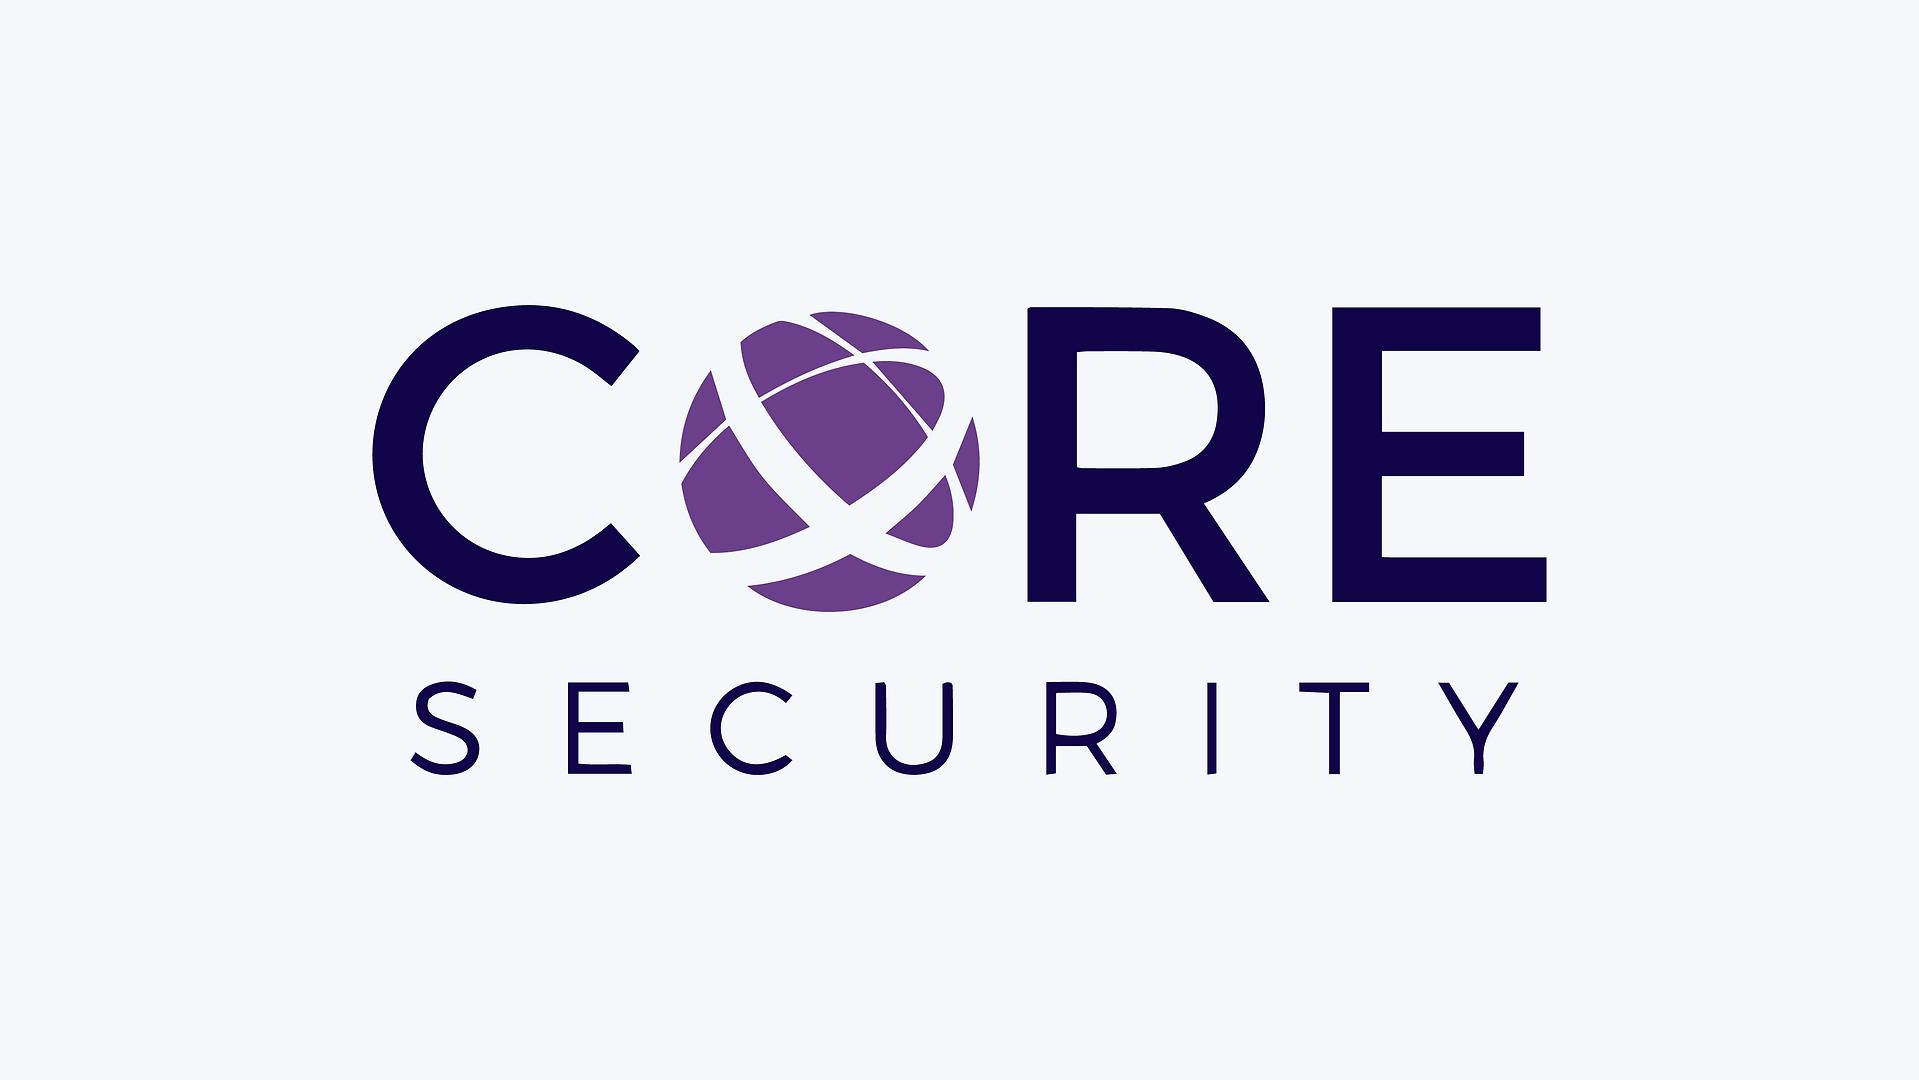 CORE SECURITY